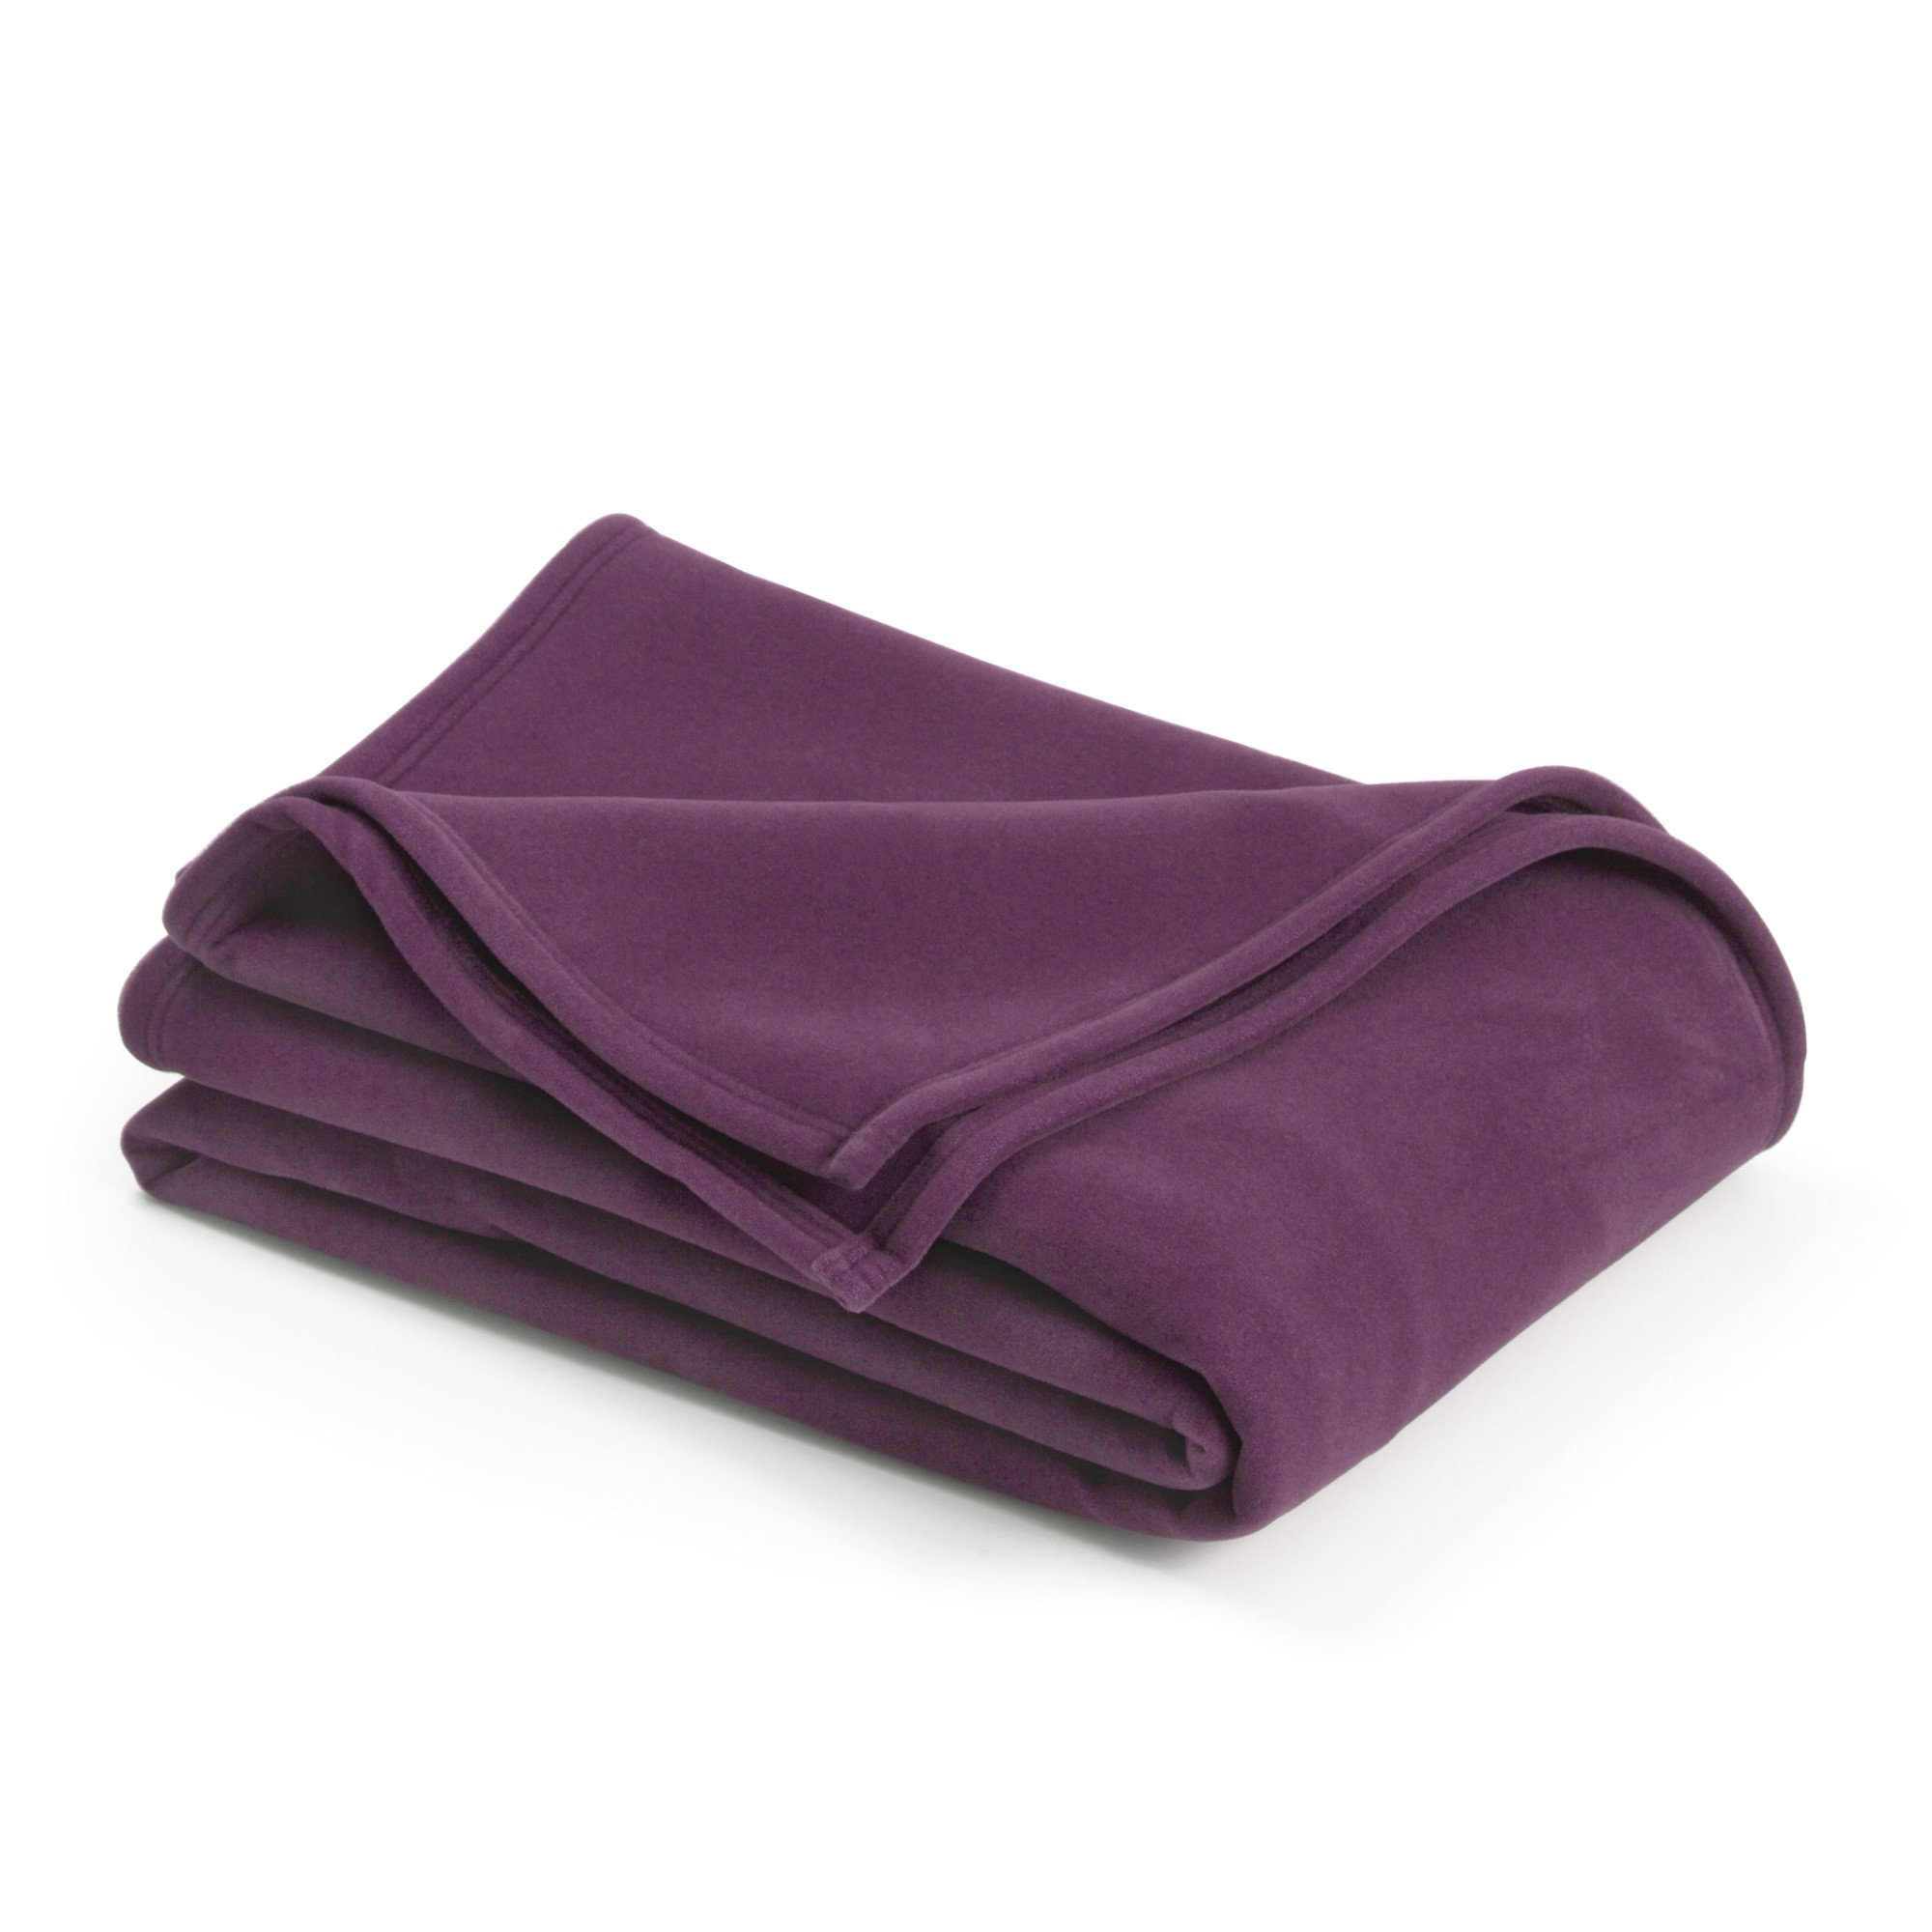 Vellux Original Blanket, Full/Queen 90 x 90, Deep Plum